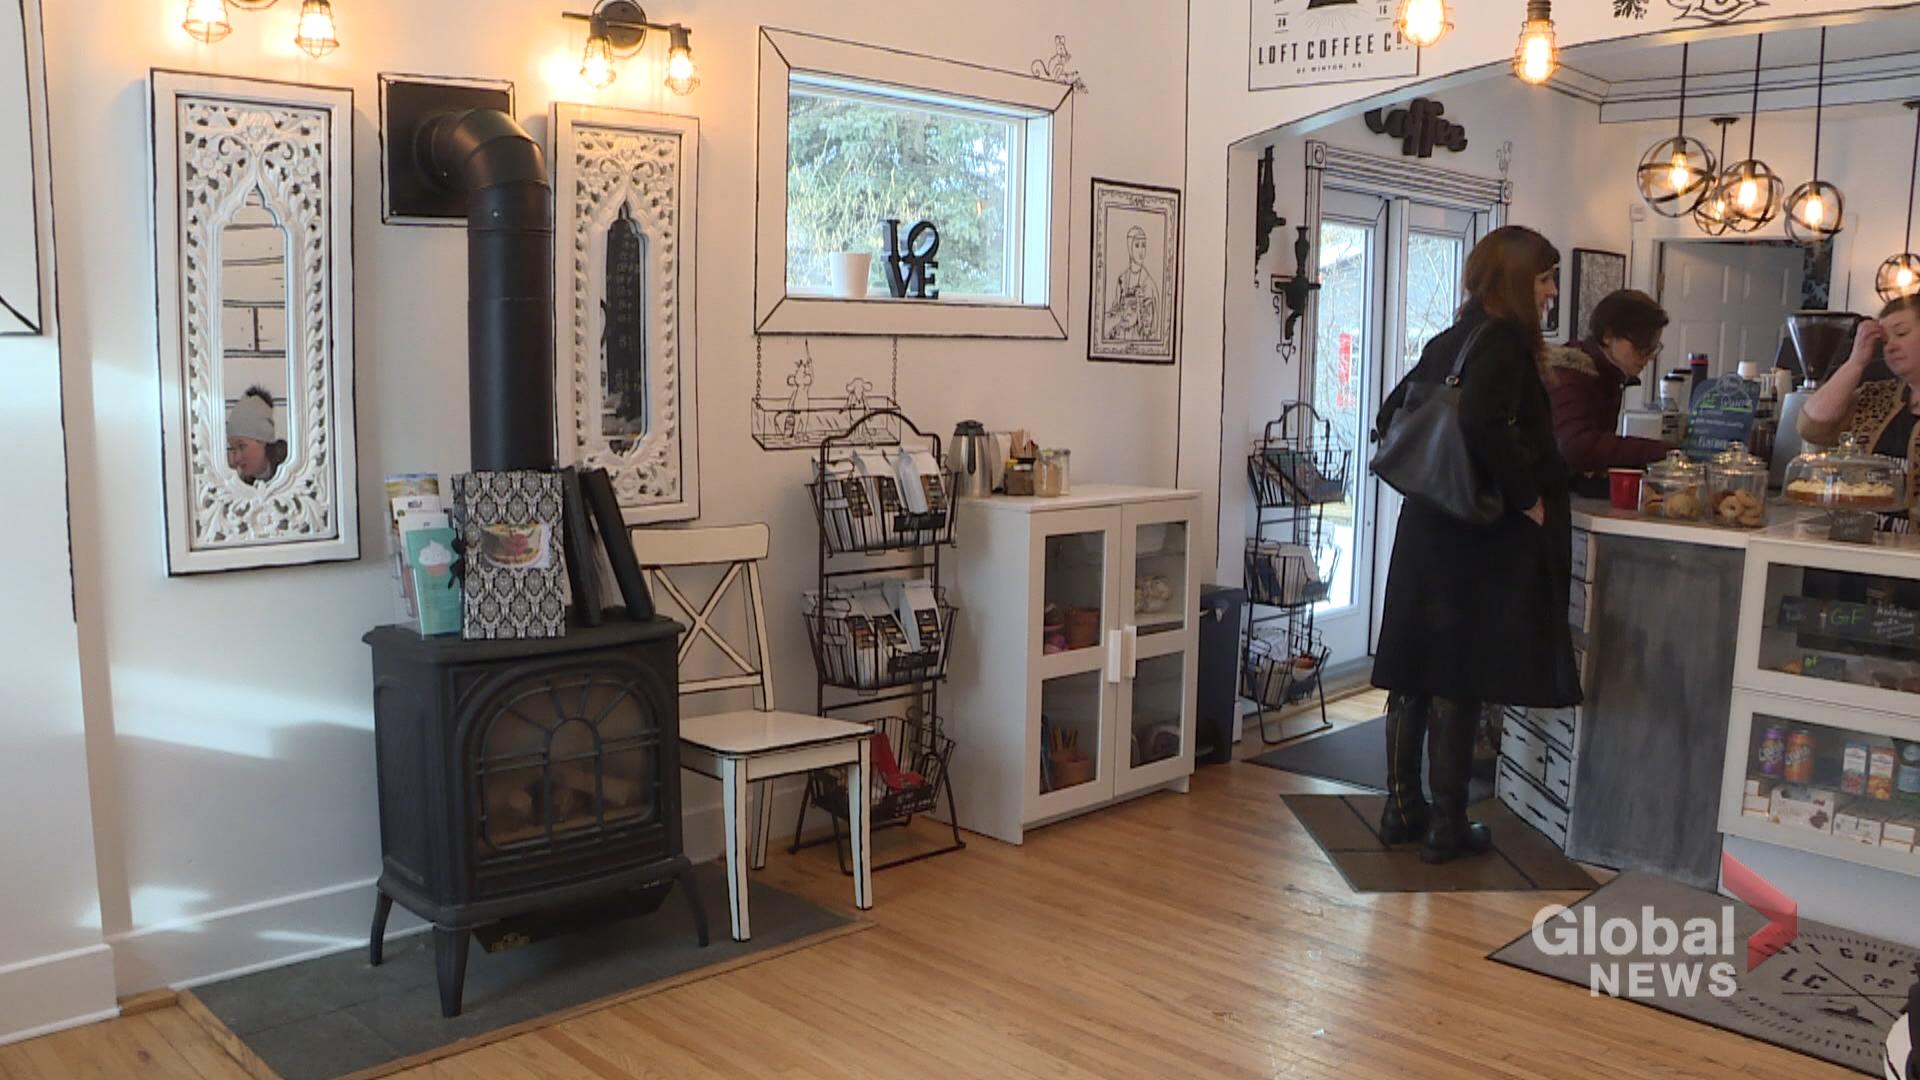 Alberta Coffee Shop Turns Two Dimensional Watch News Videos Online